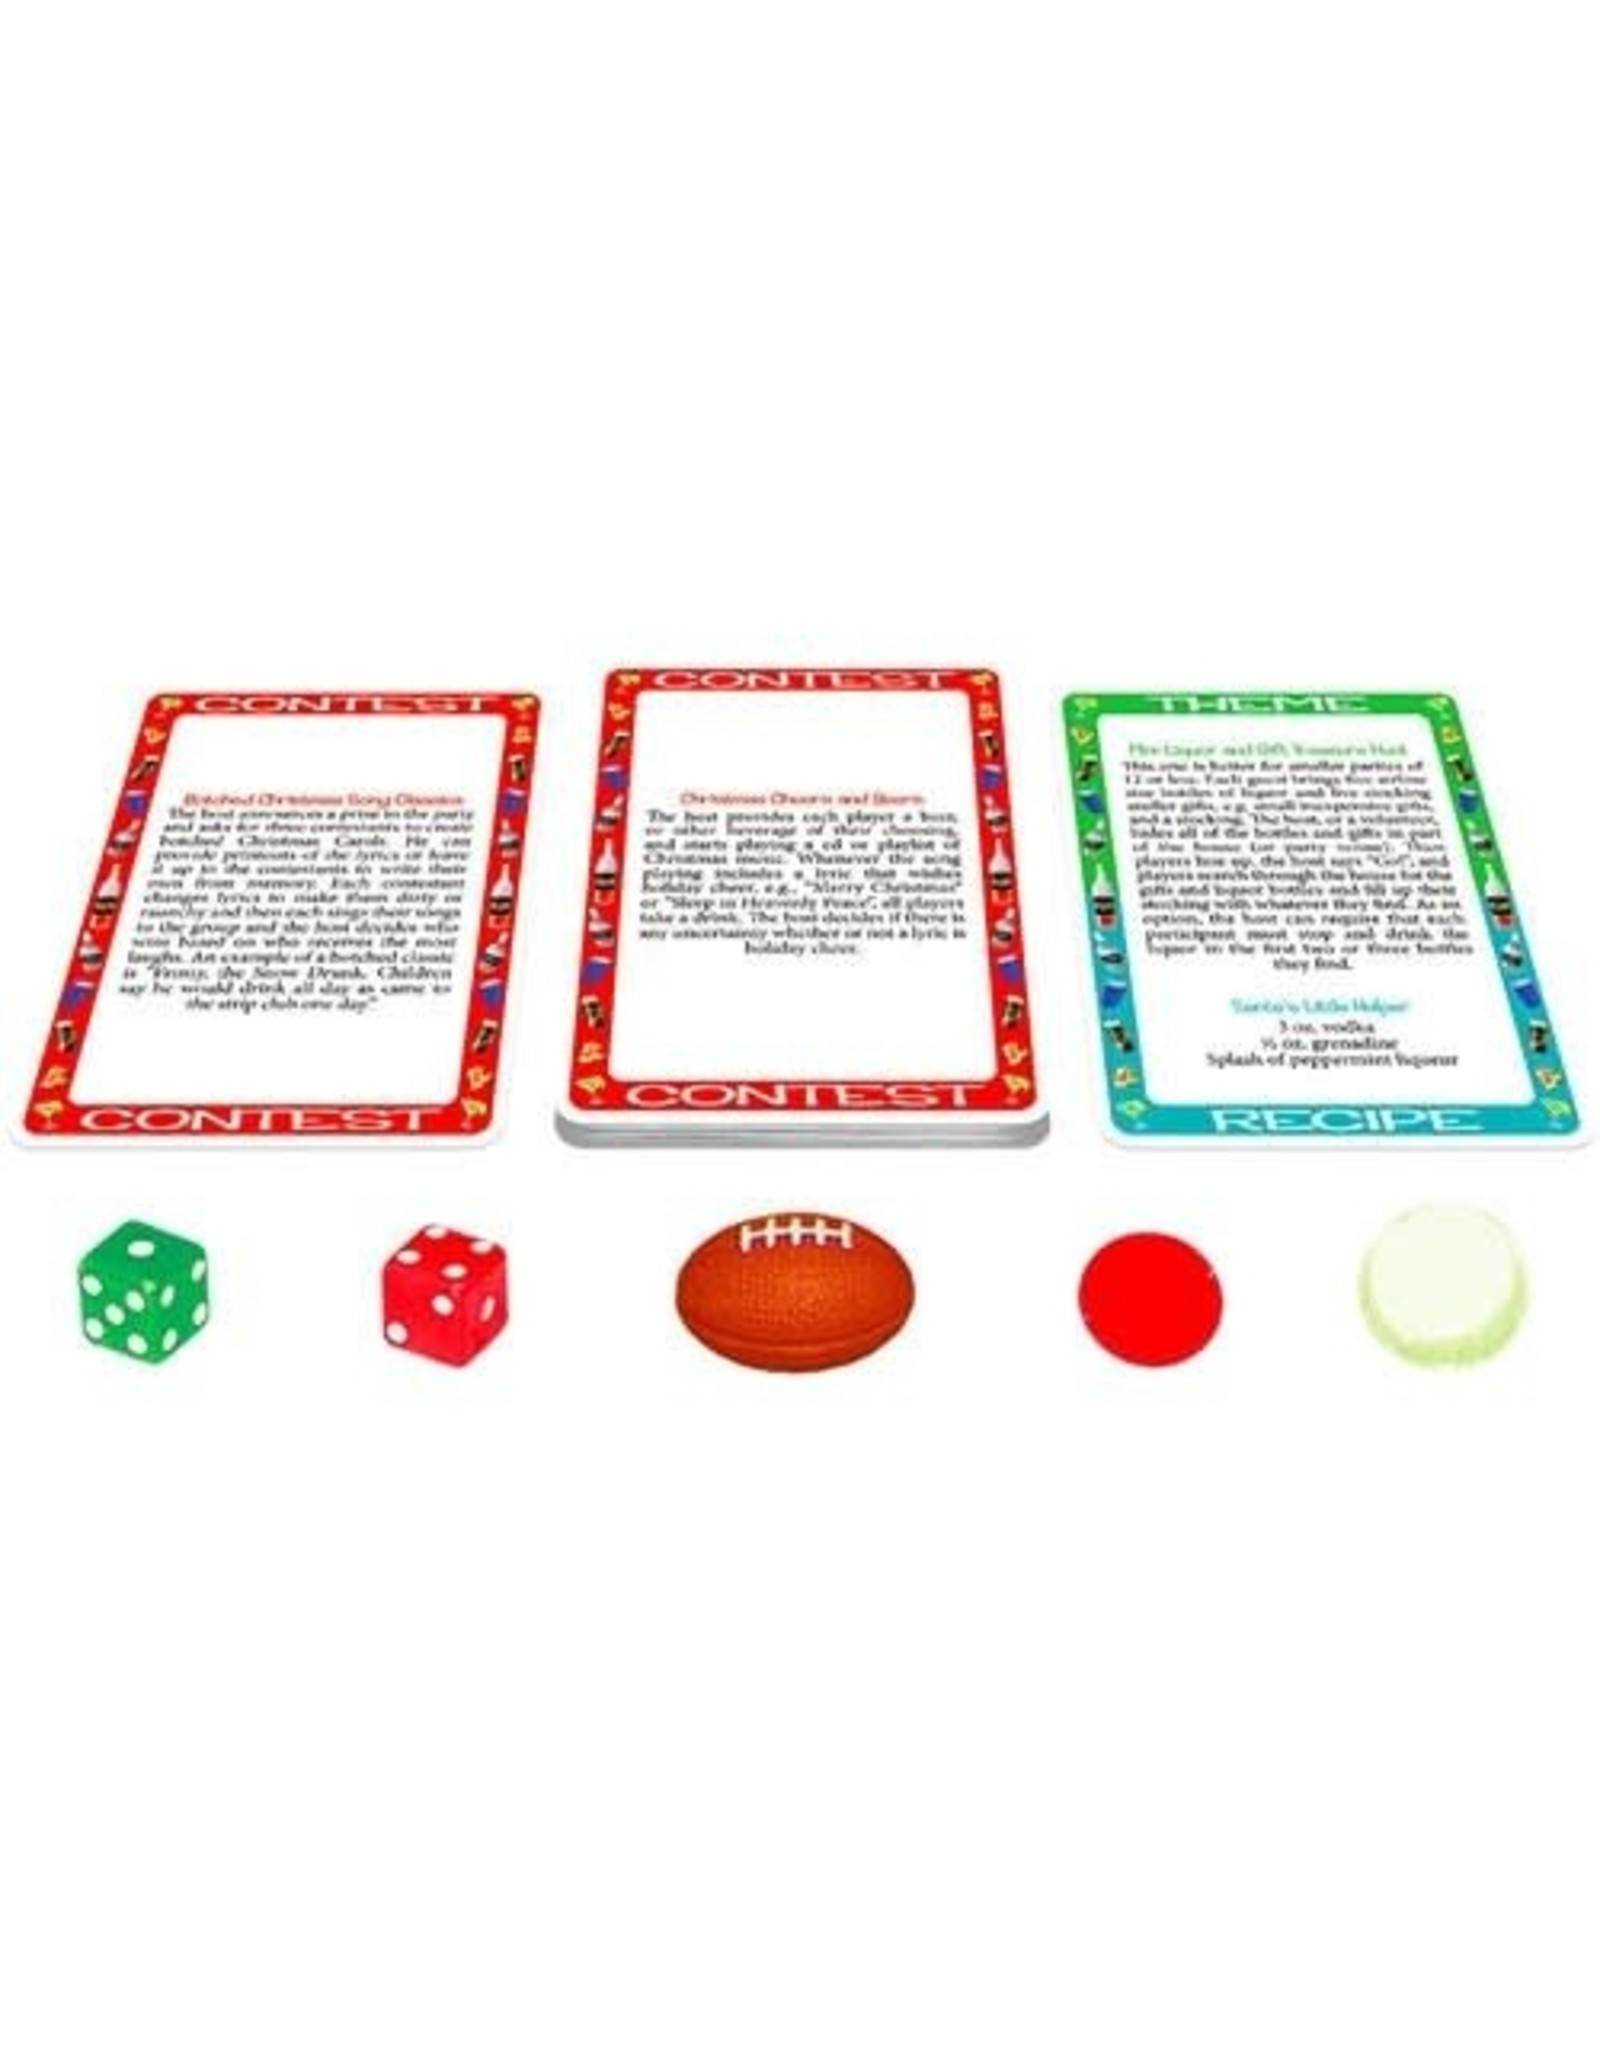 KHEPER GAMES HOLIDAY HELPER GAME